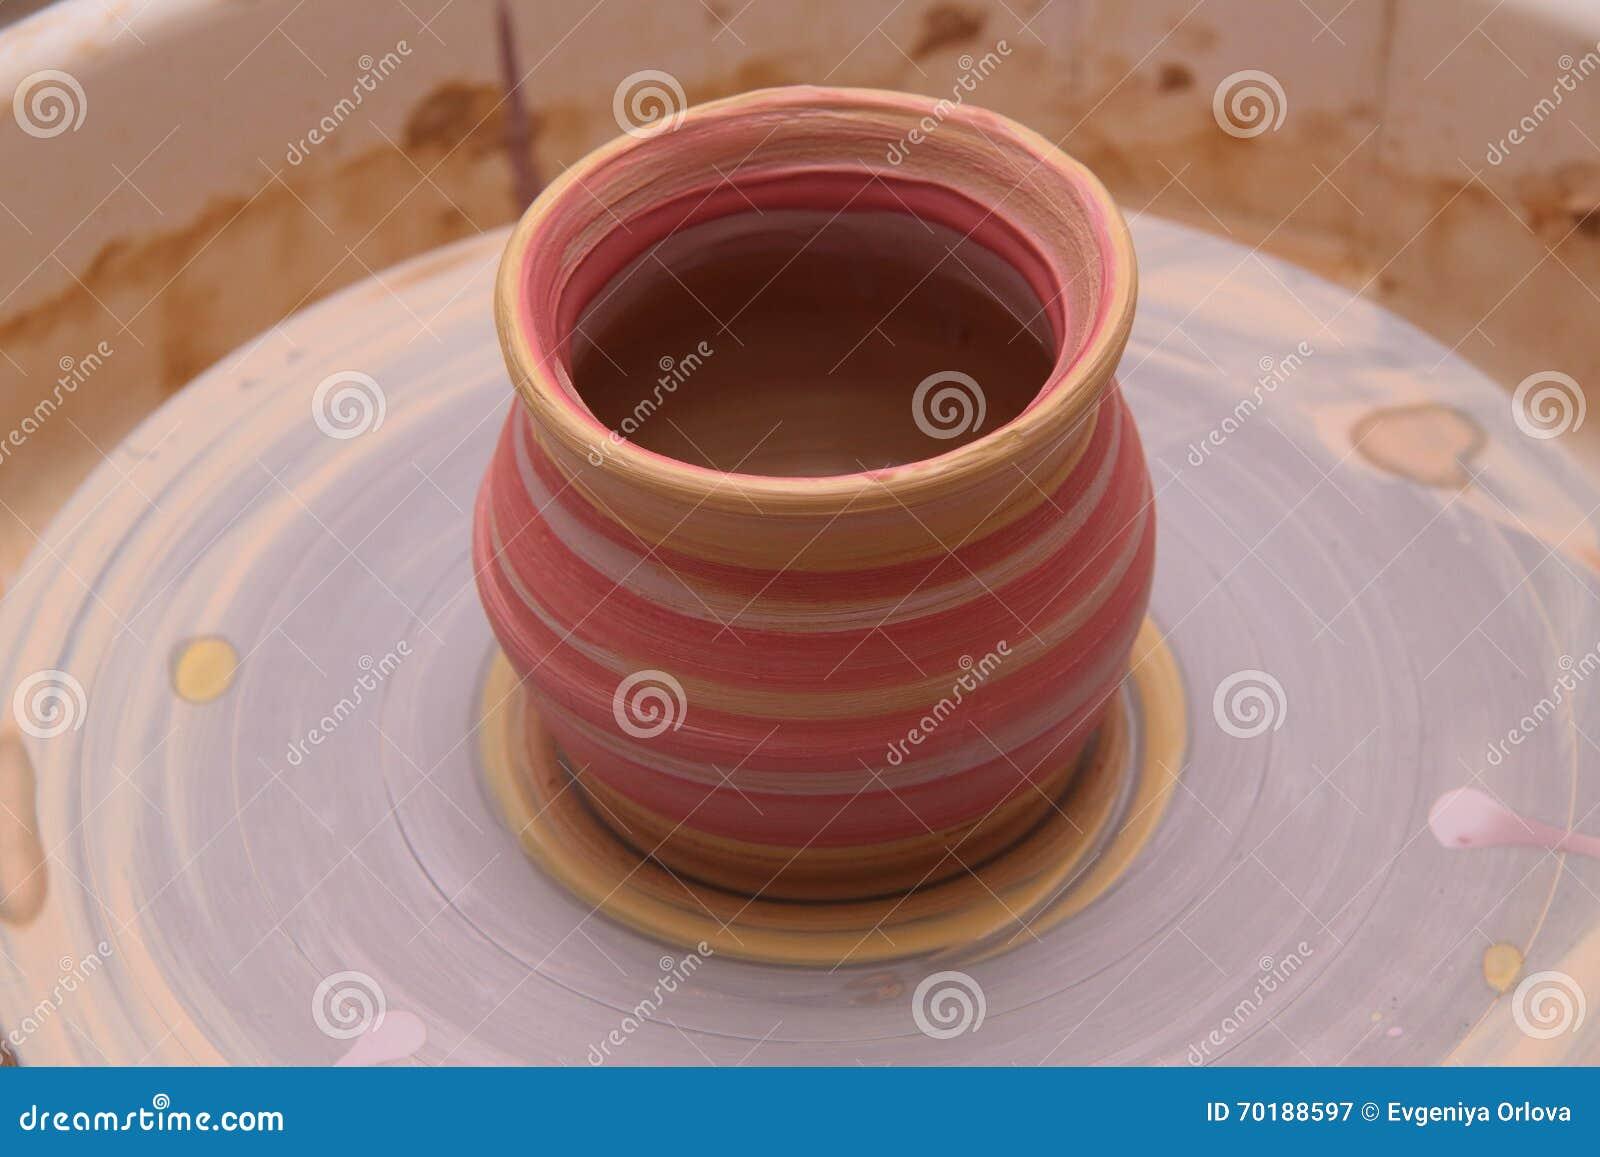 Lerakruka på ett keramikerhjul